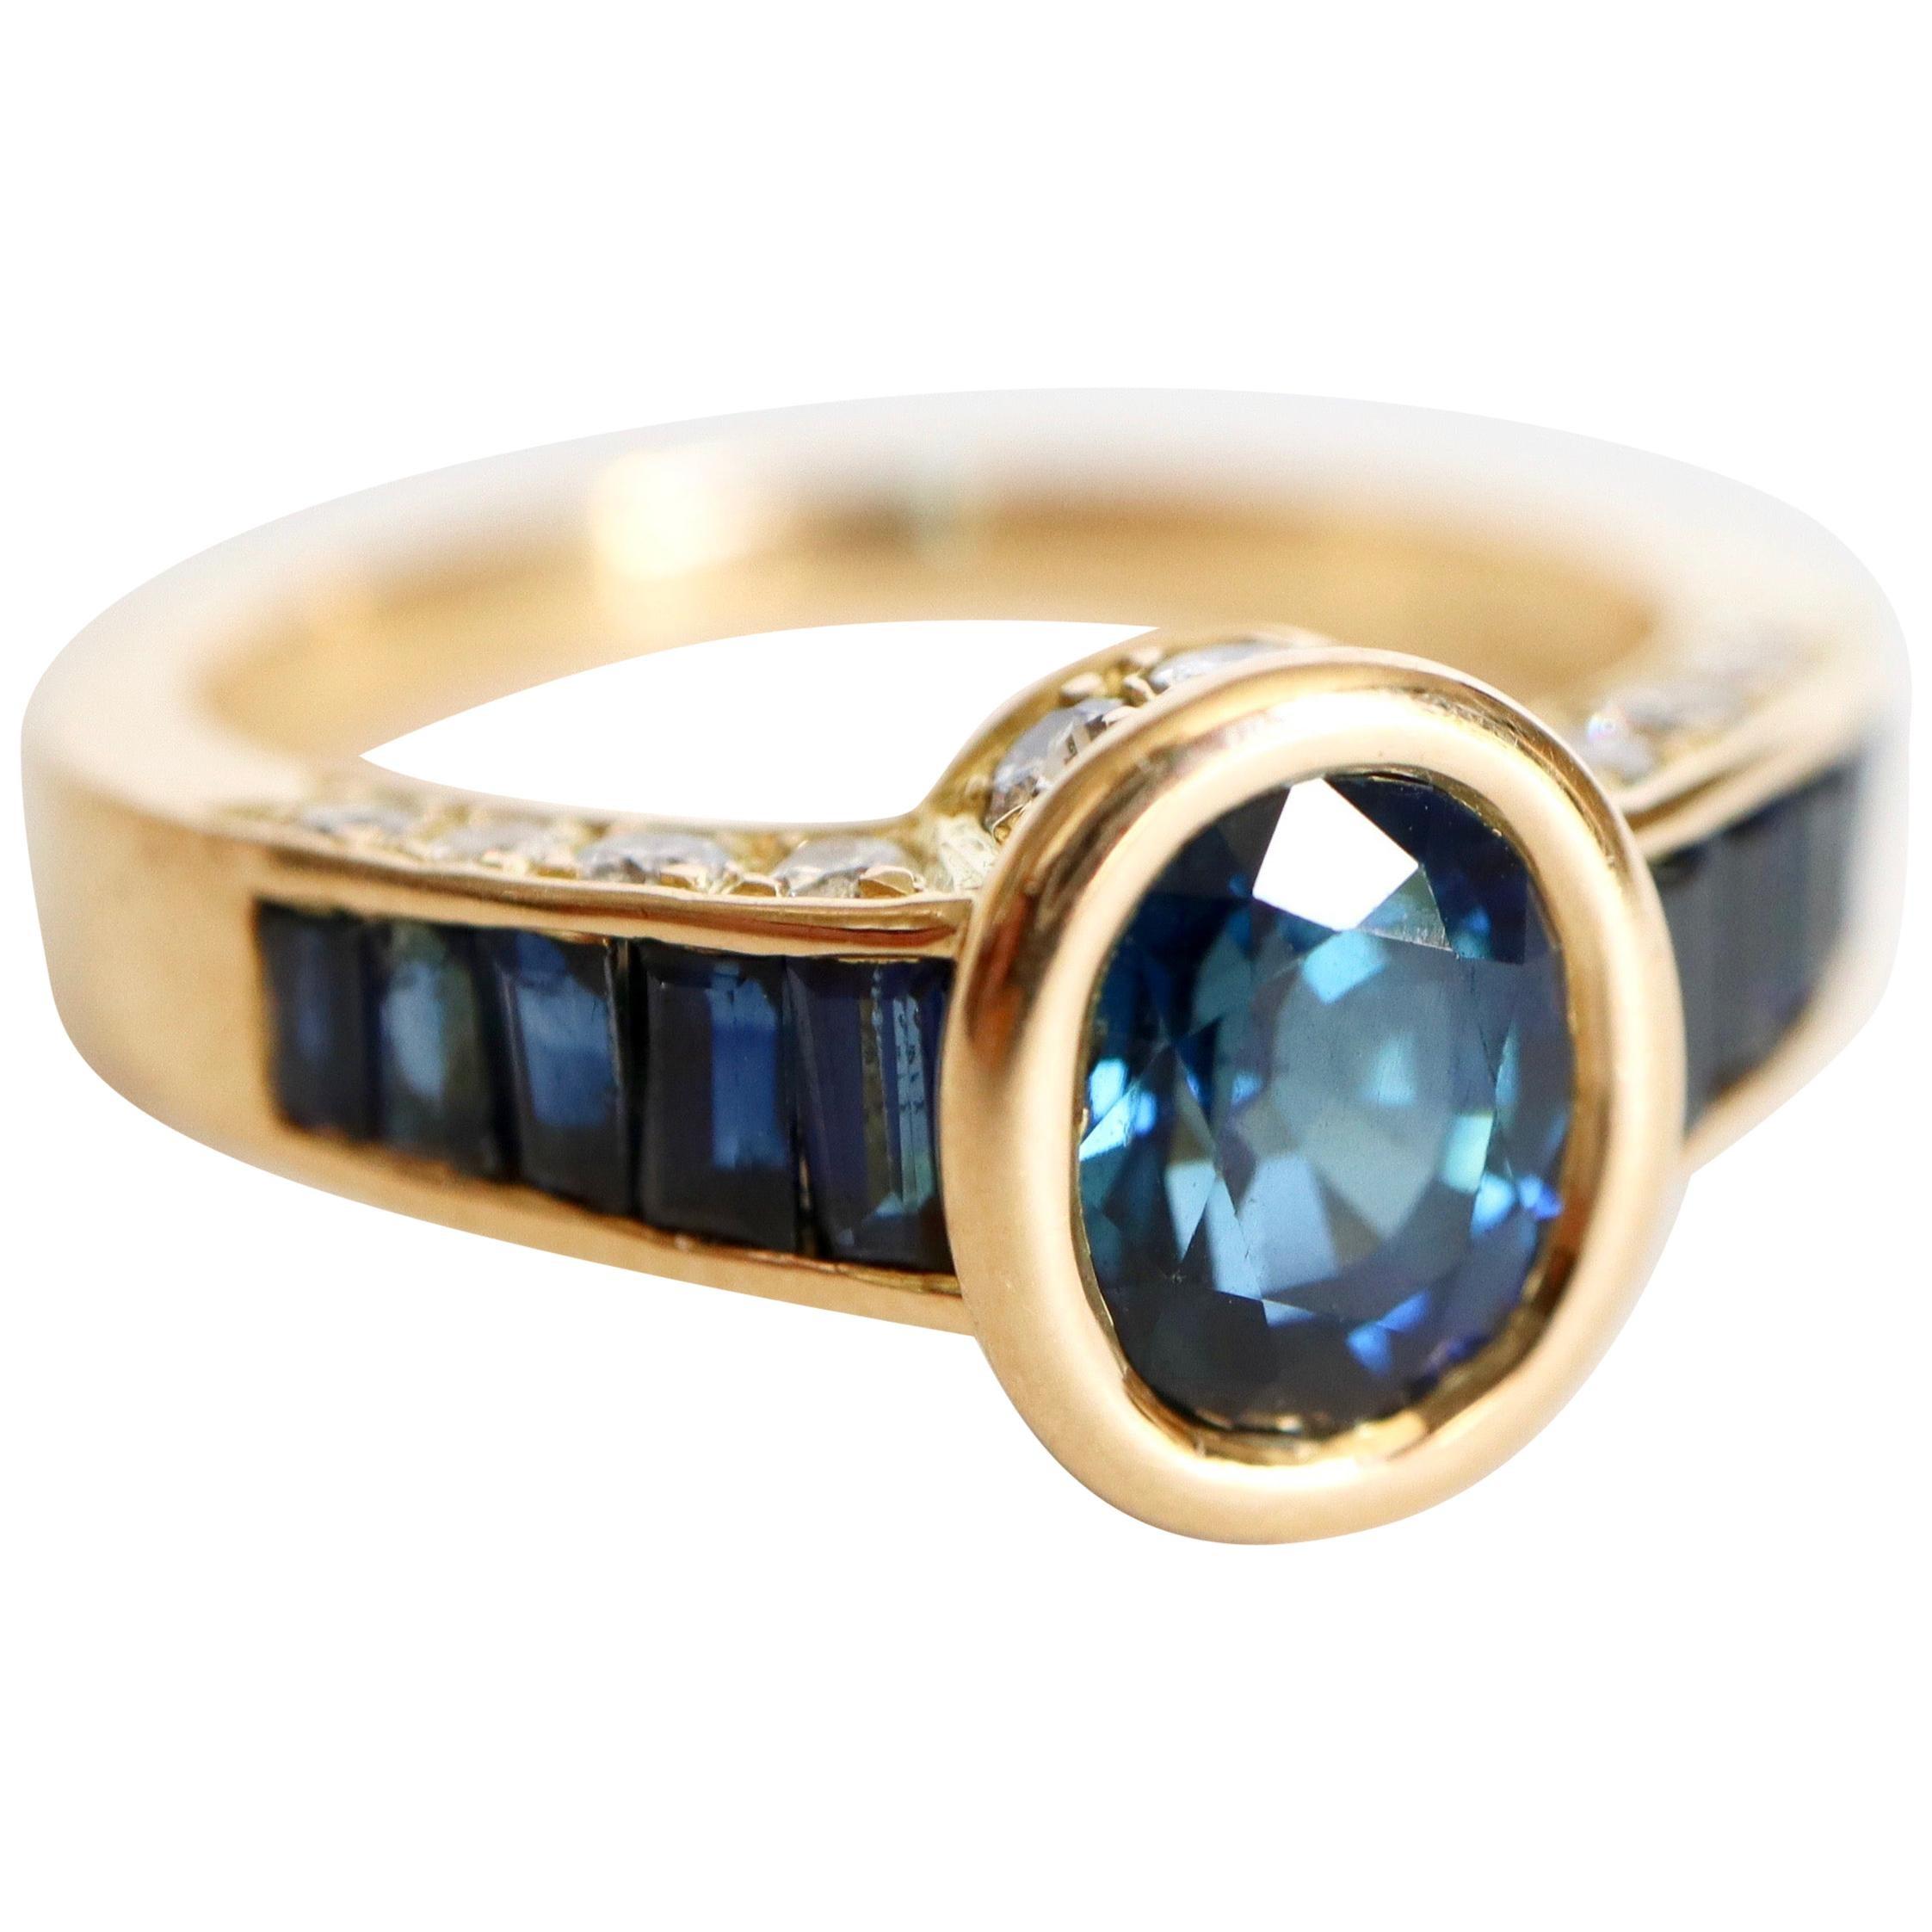 Mauboussin Ring in 18 Karat Yellow Gold Sapphires and Diamonds